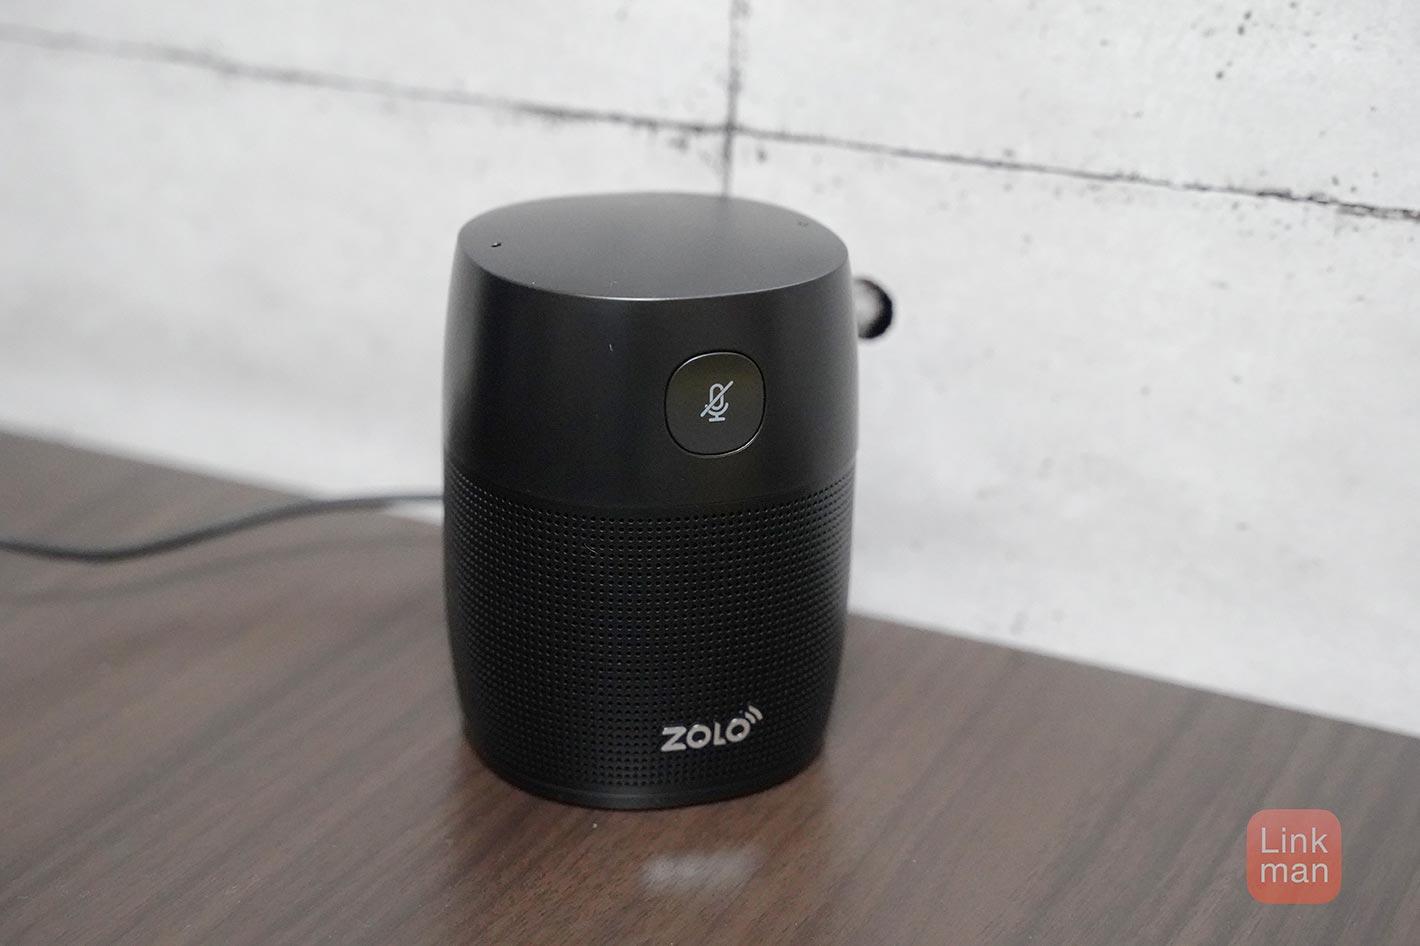 Anker、Googleアシスタント搭載のスマートスピーカー「Zolo SonicG」販売開始